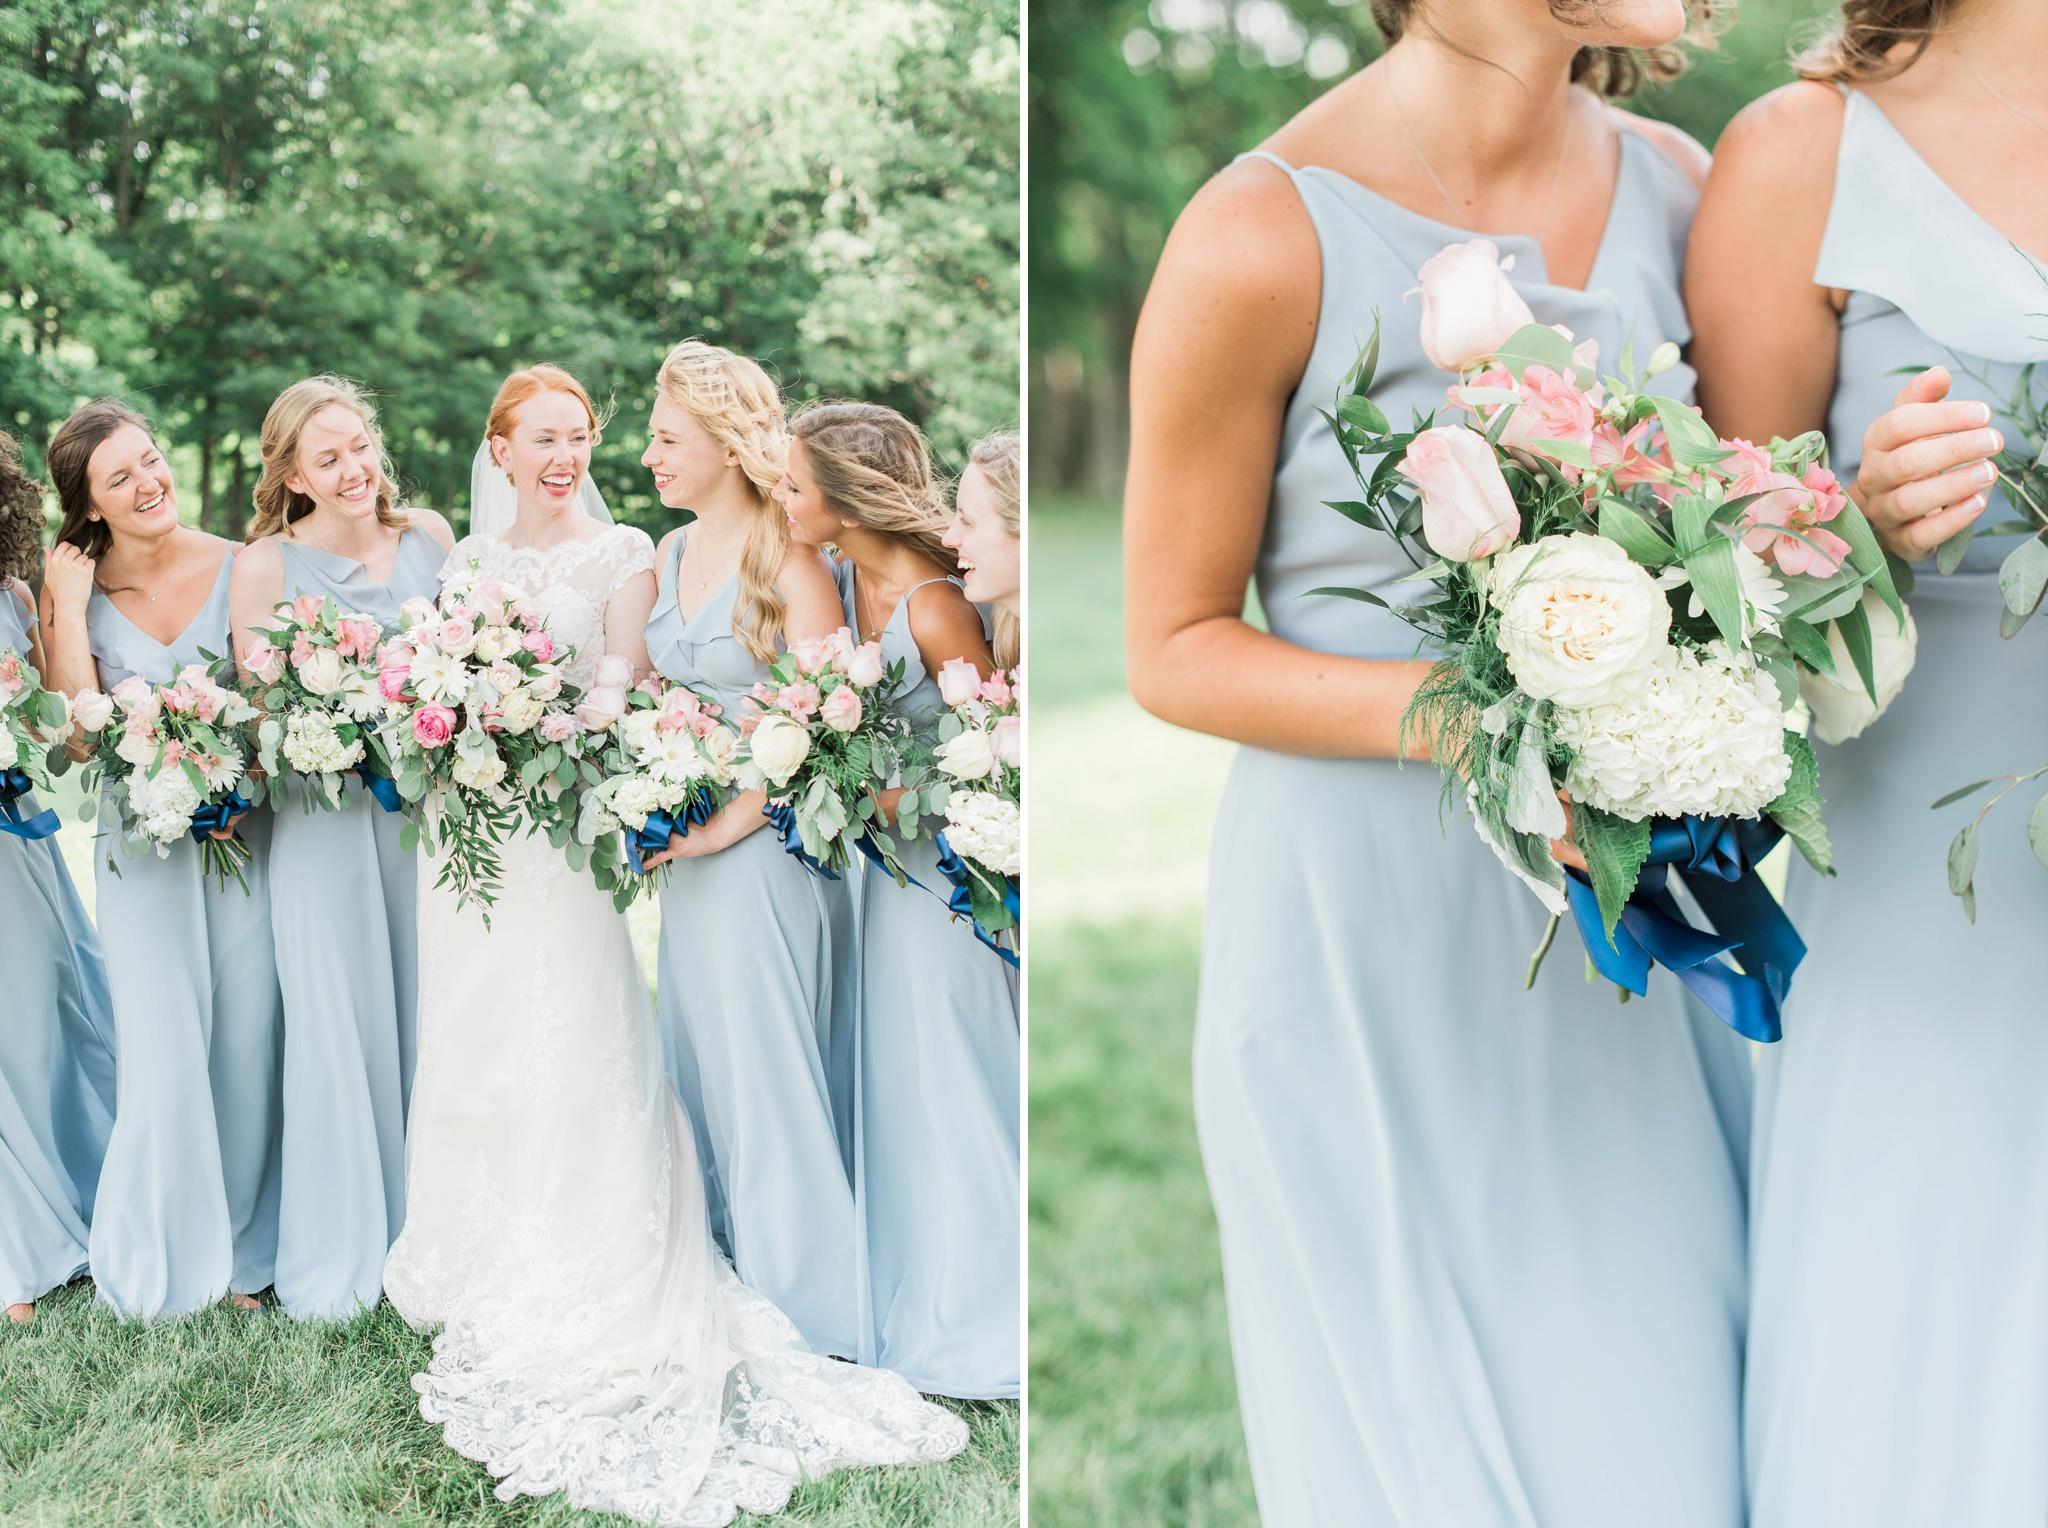 sunbury-ohio-wedding-hannah-johnathan_0041.jpg